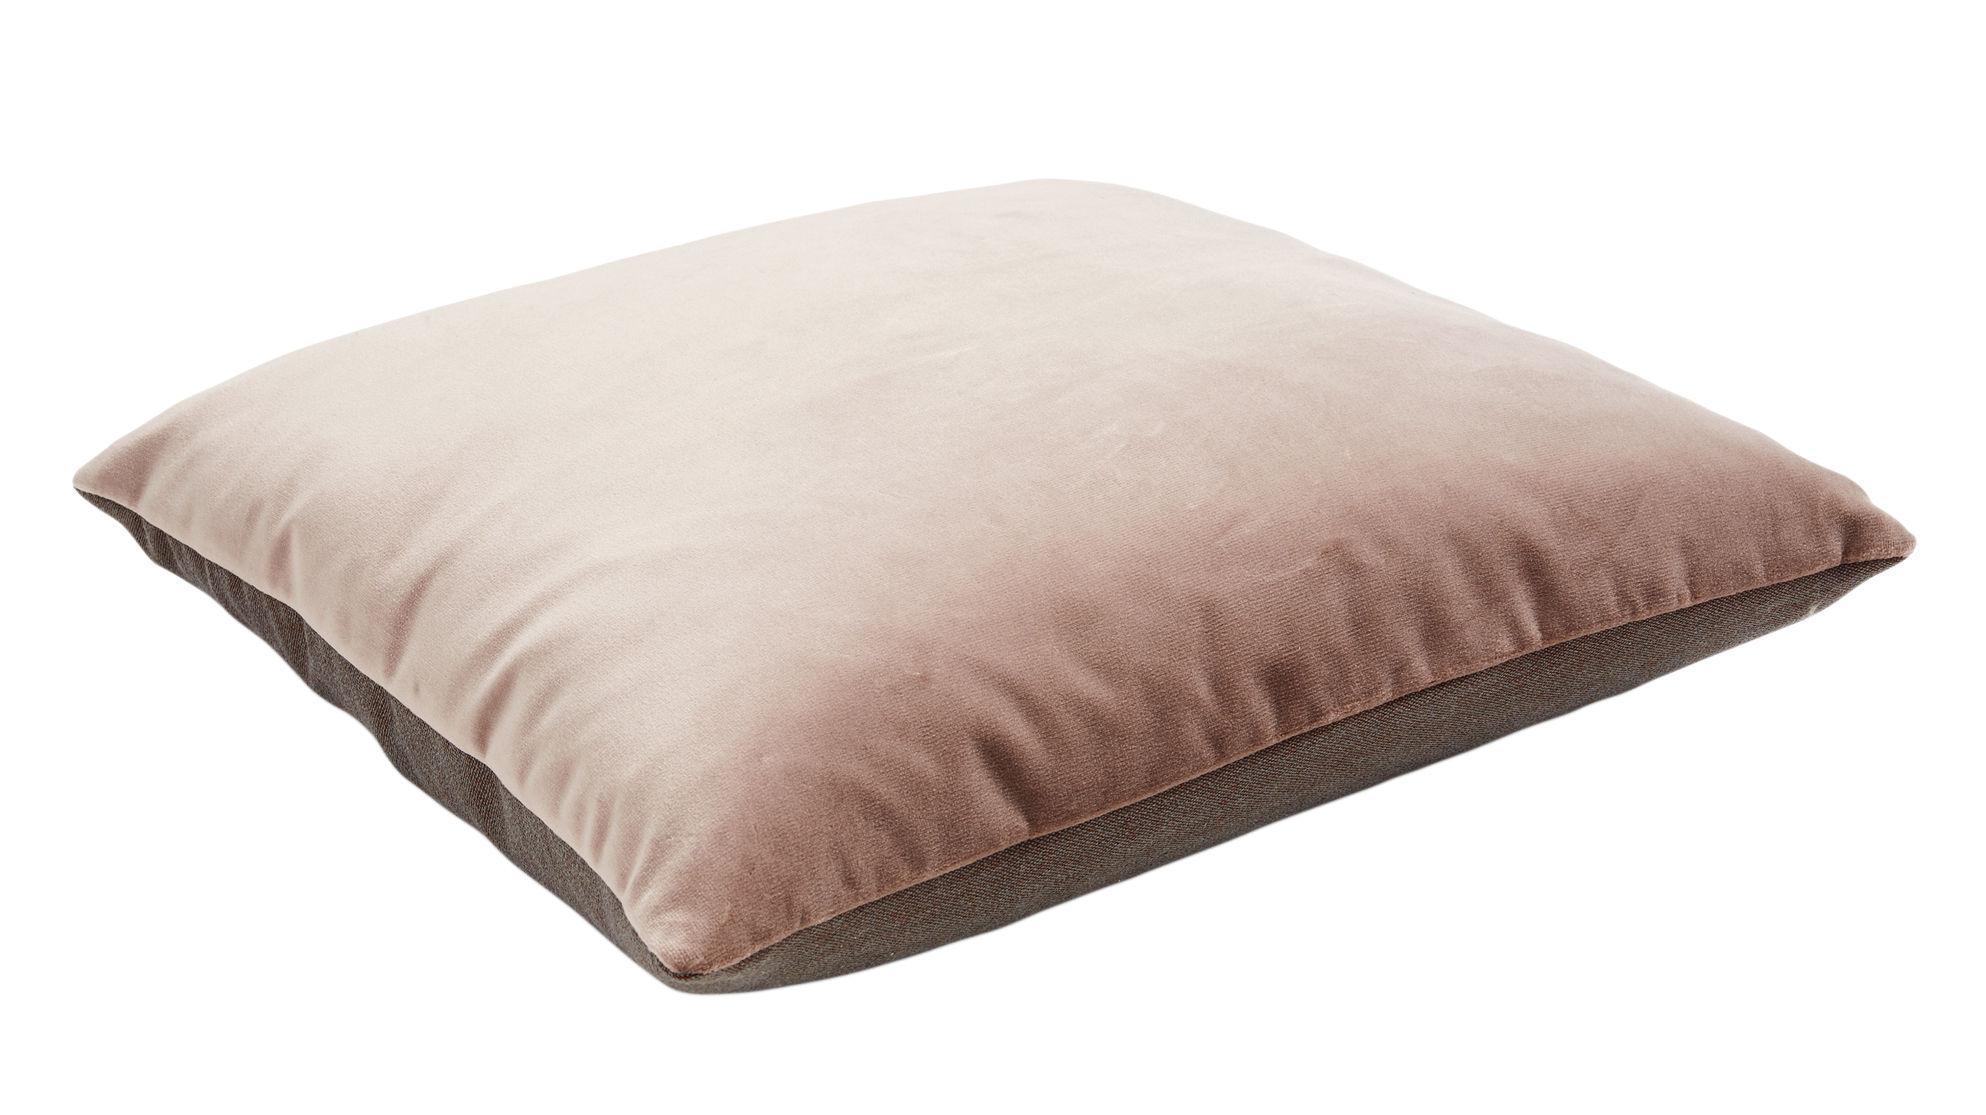 kissen eclectic von hay rosa matt made in design. Black Bedroom Furniture Sets. Home Design Ideas